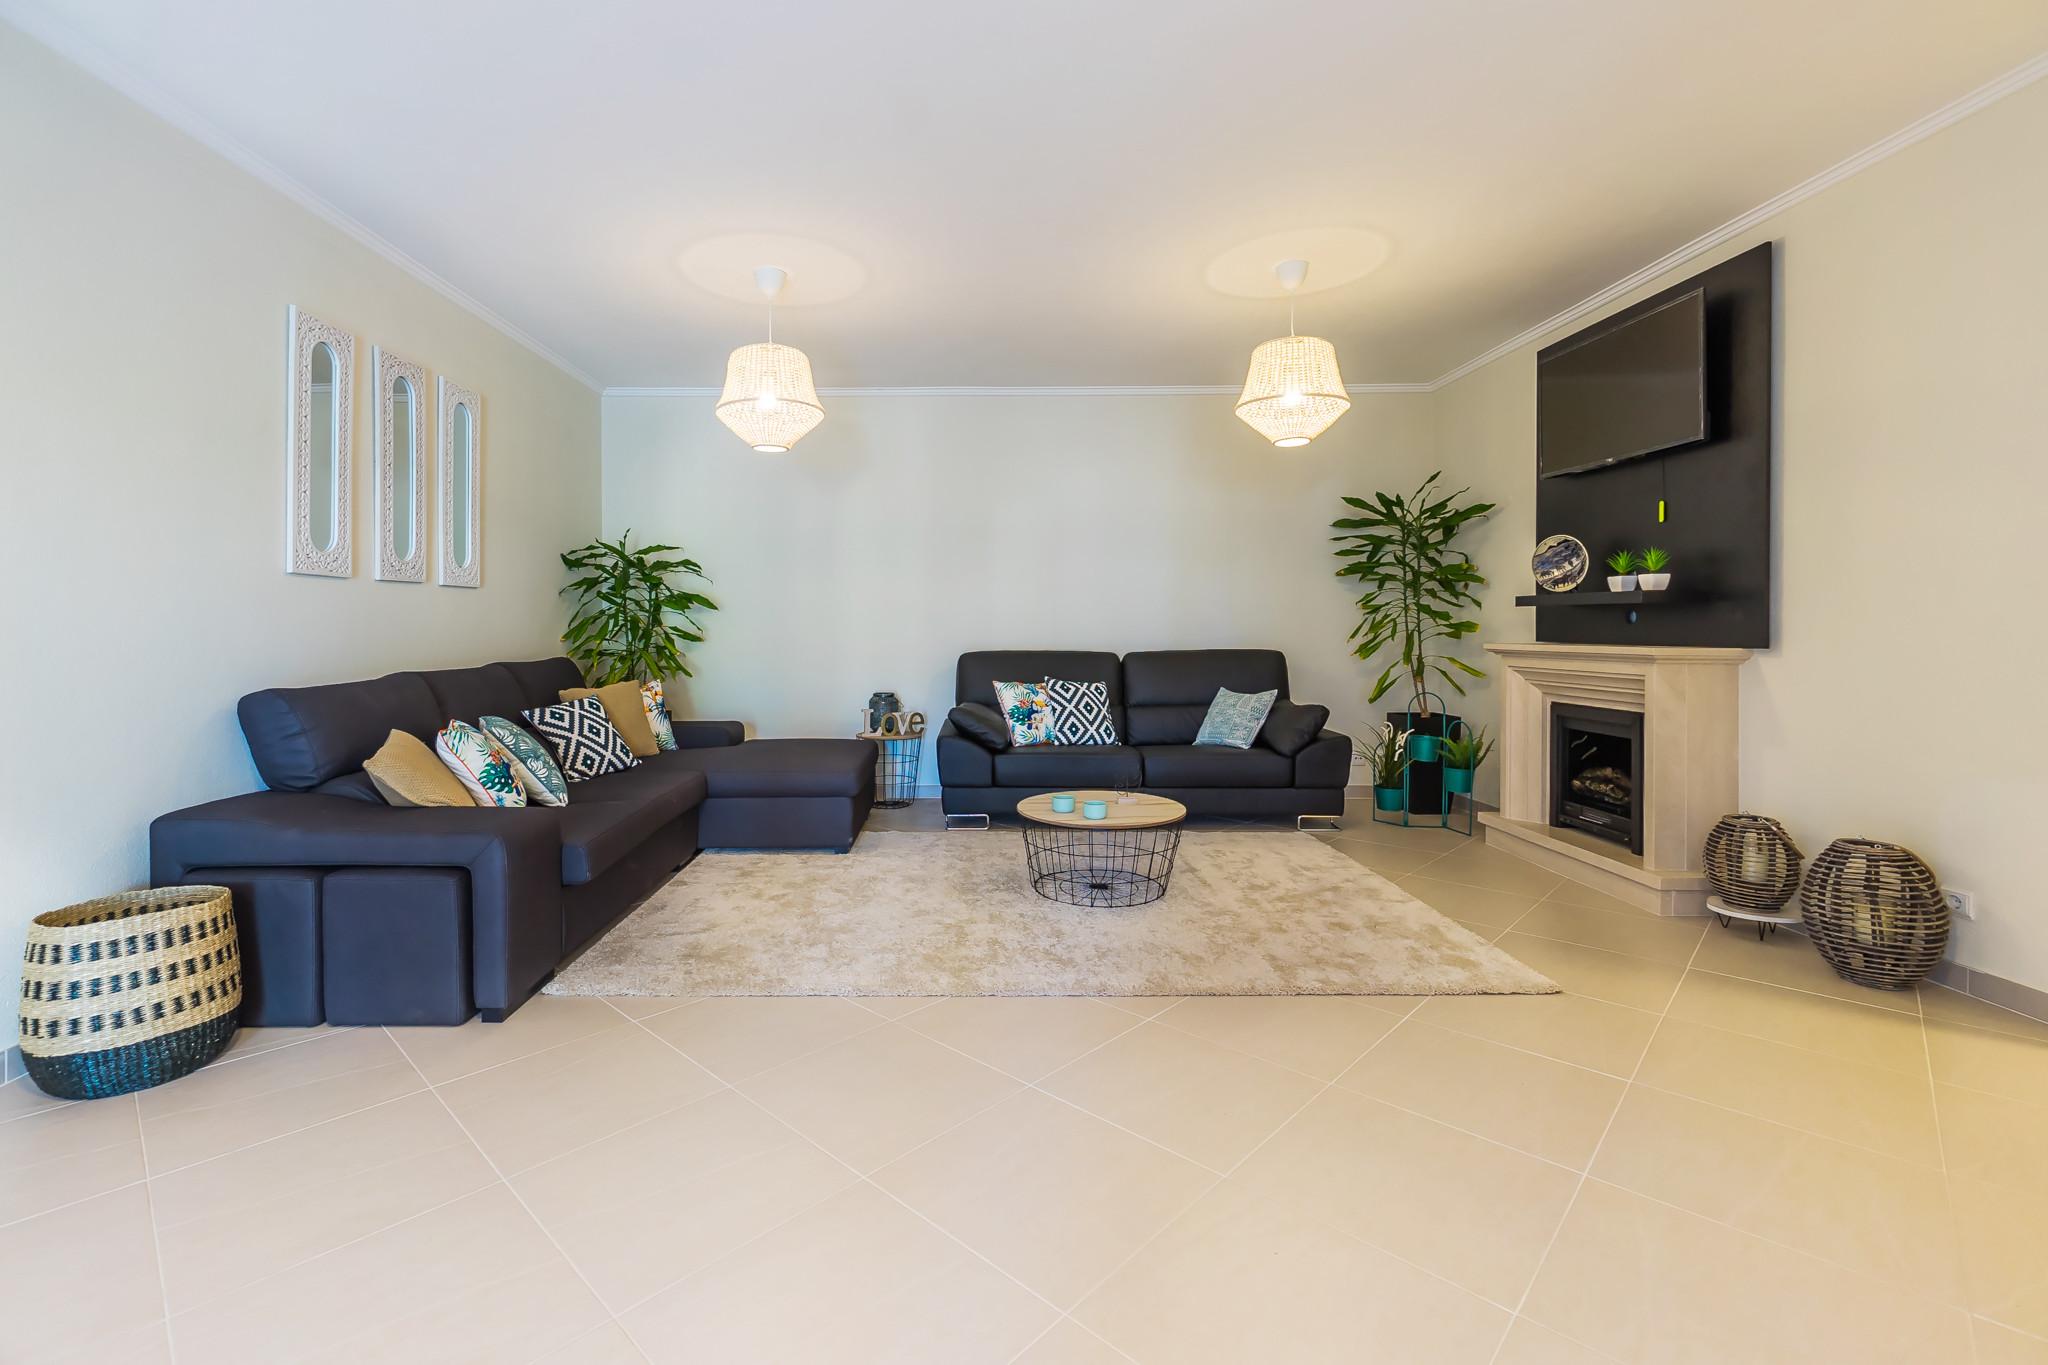 villen verdizela verdizela beach golf villa. Black Bedroom Furniture Sets. Home Design Ideas